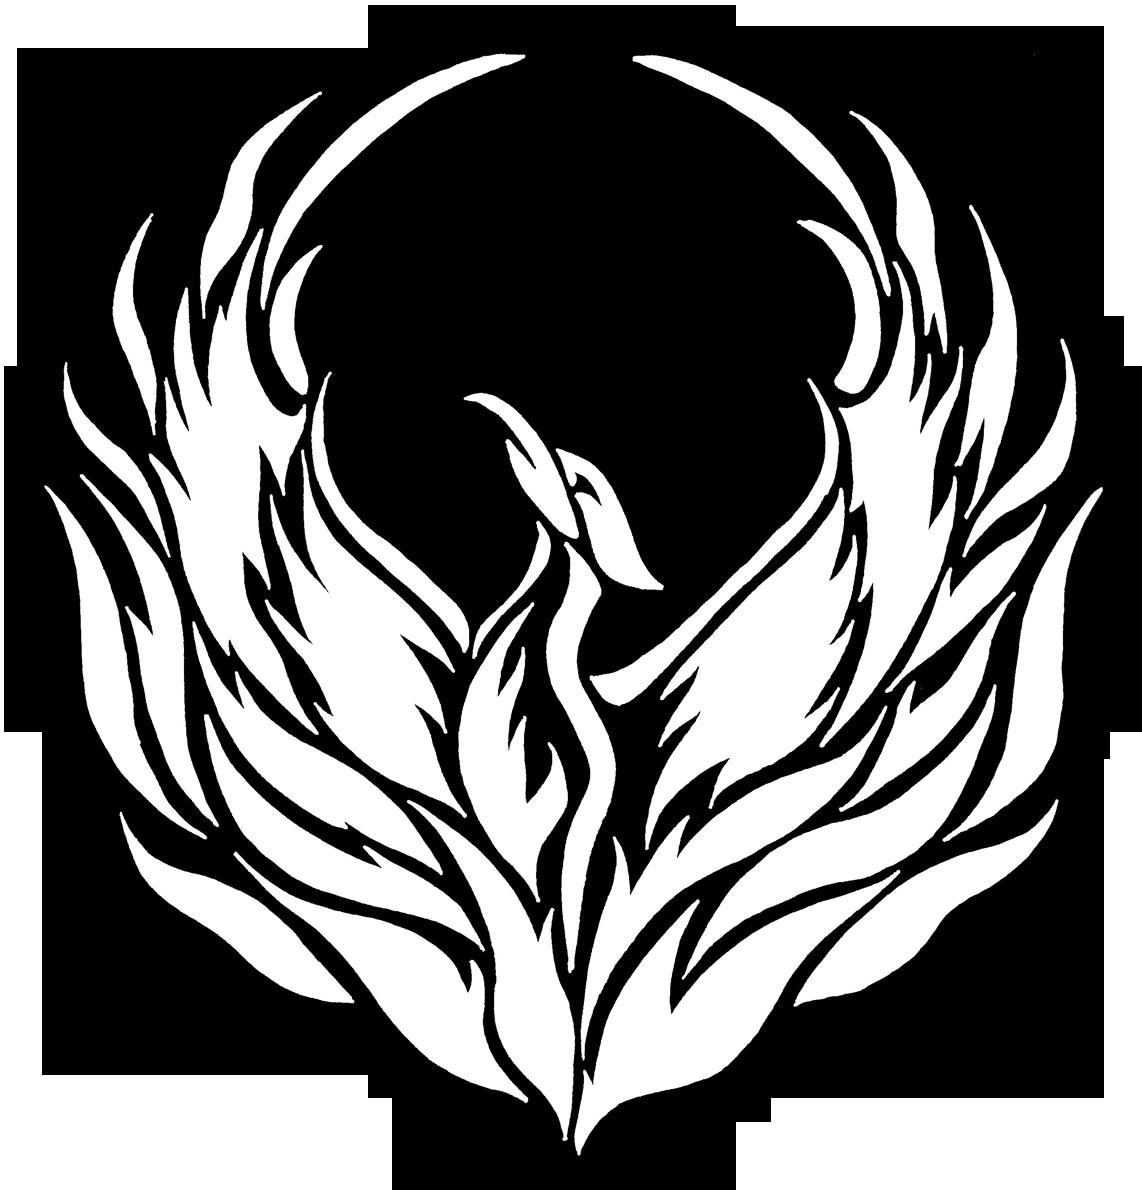 transparent library pheonix drawing logo #101209881